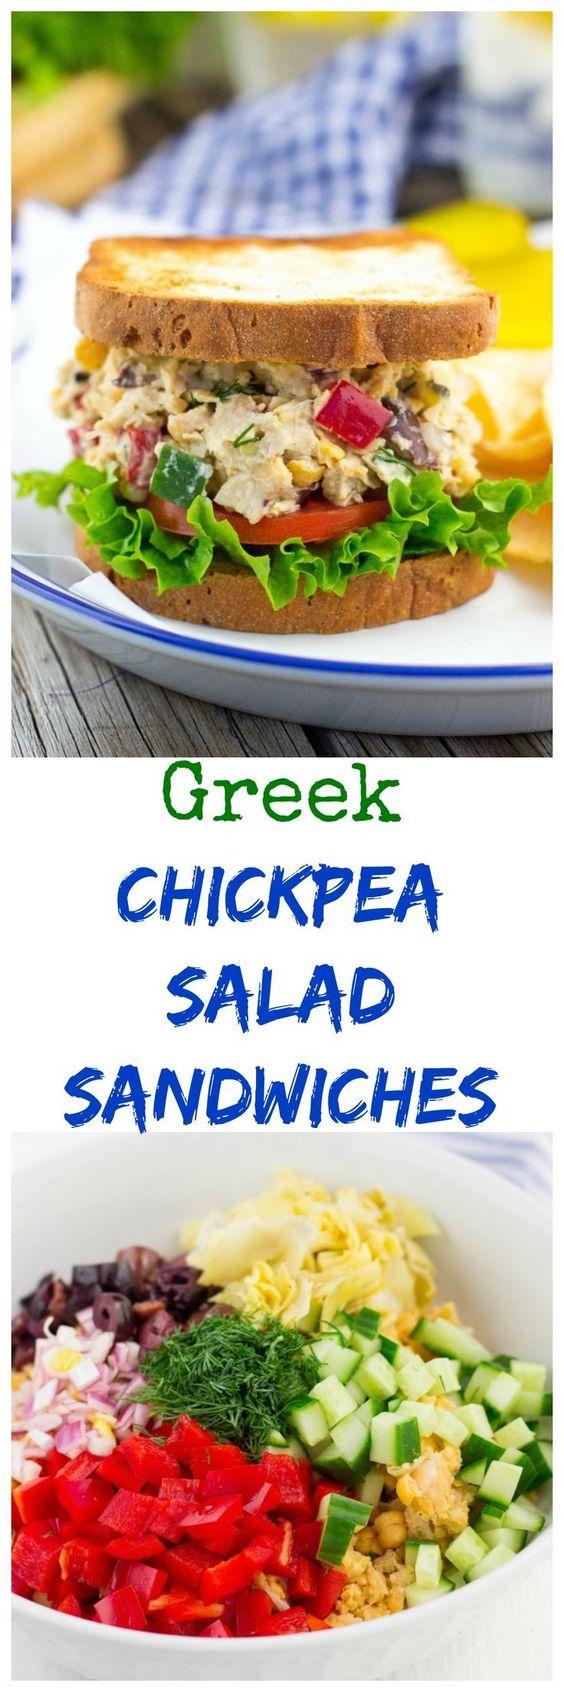 Greek Chickpea Salad Sandwiches (vegan) | Recipe ...